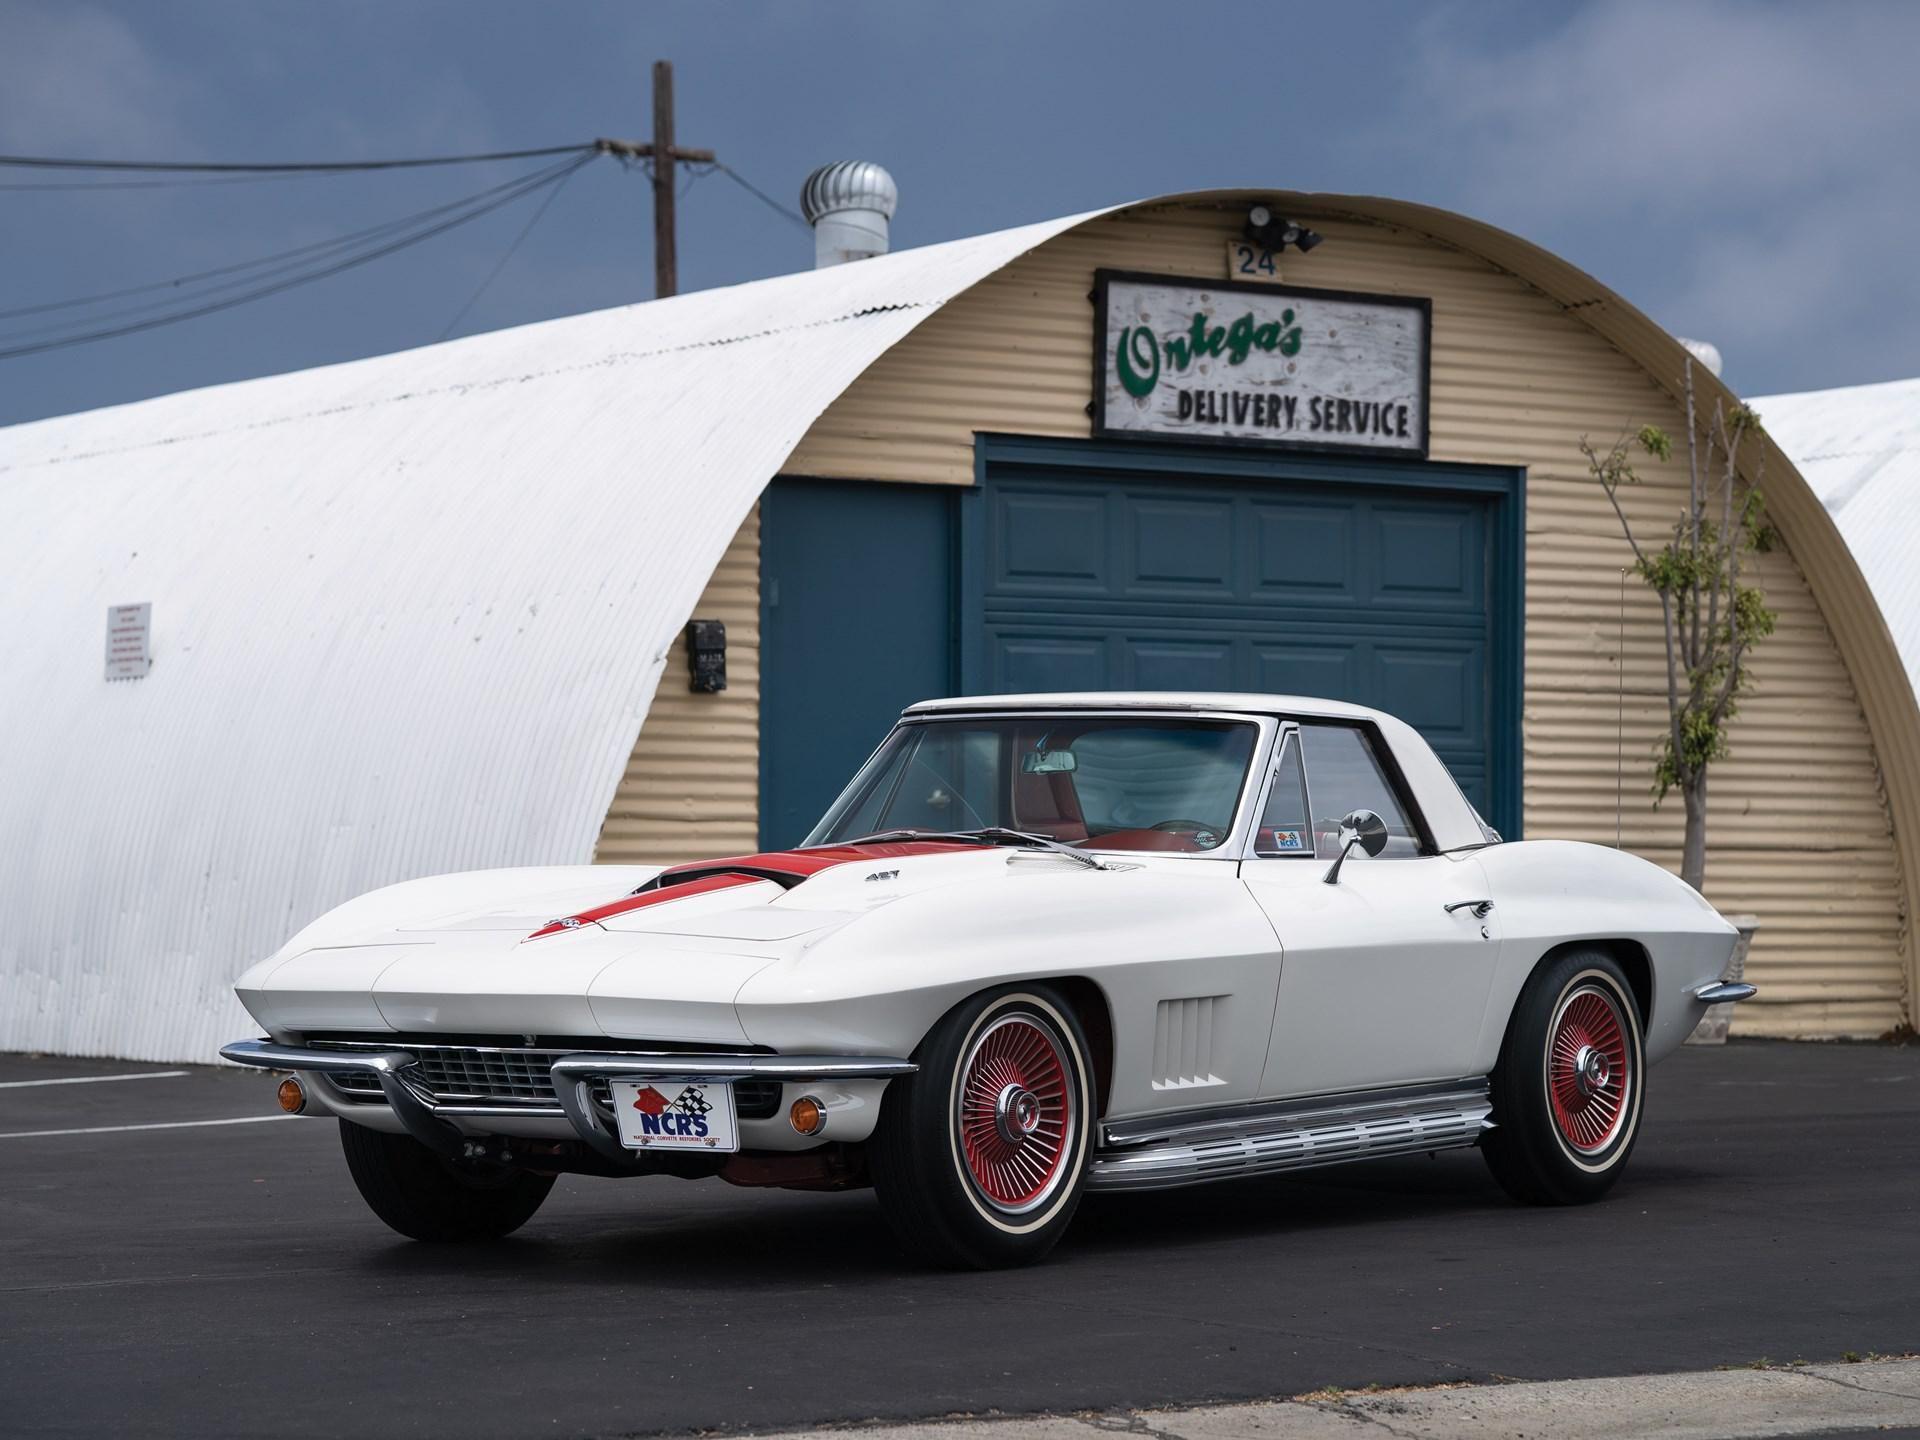 1967 Chevrolet Corvette Sting Ray Copo Convertible